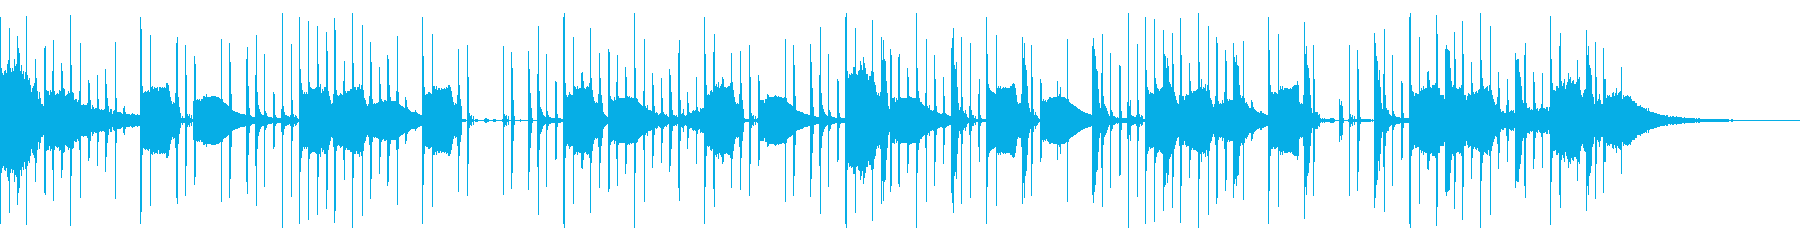 98 BPMの再生済みの波形